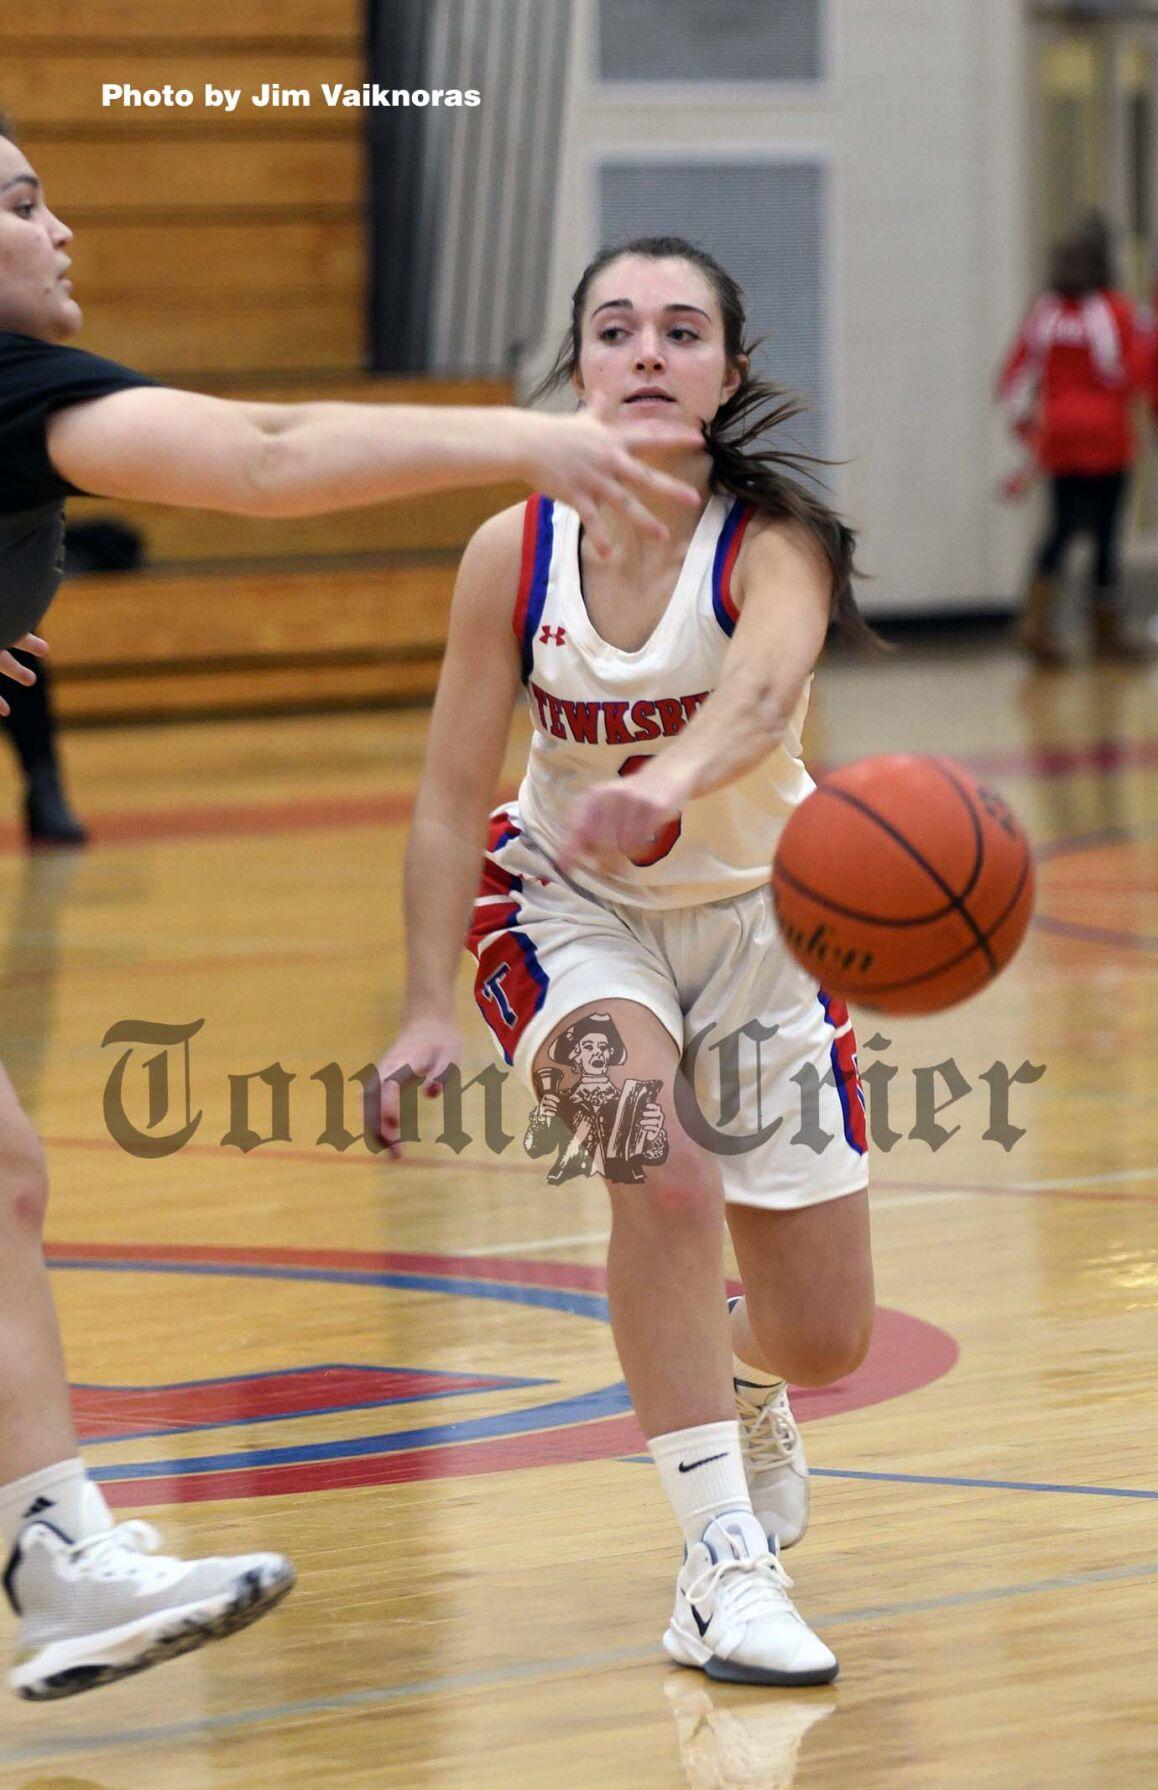 Lexi Polimeno and her teammates hope for a basketball season